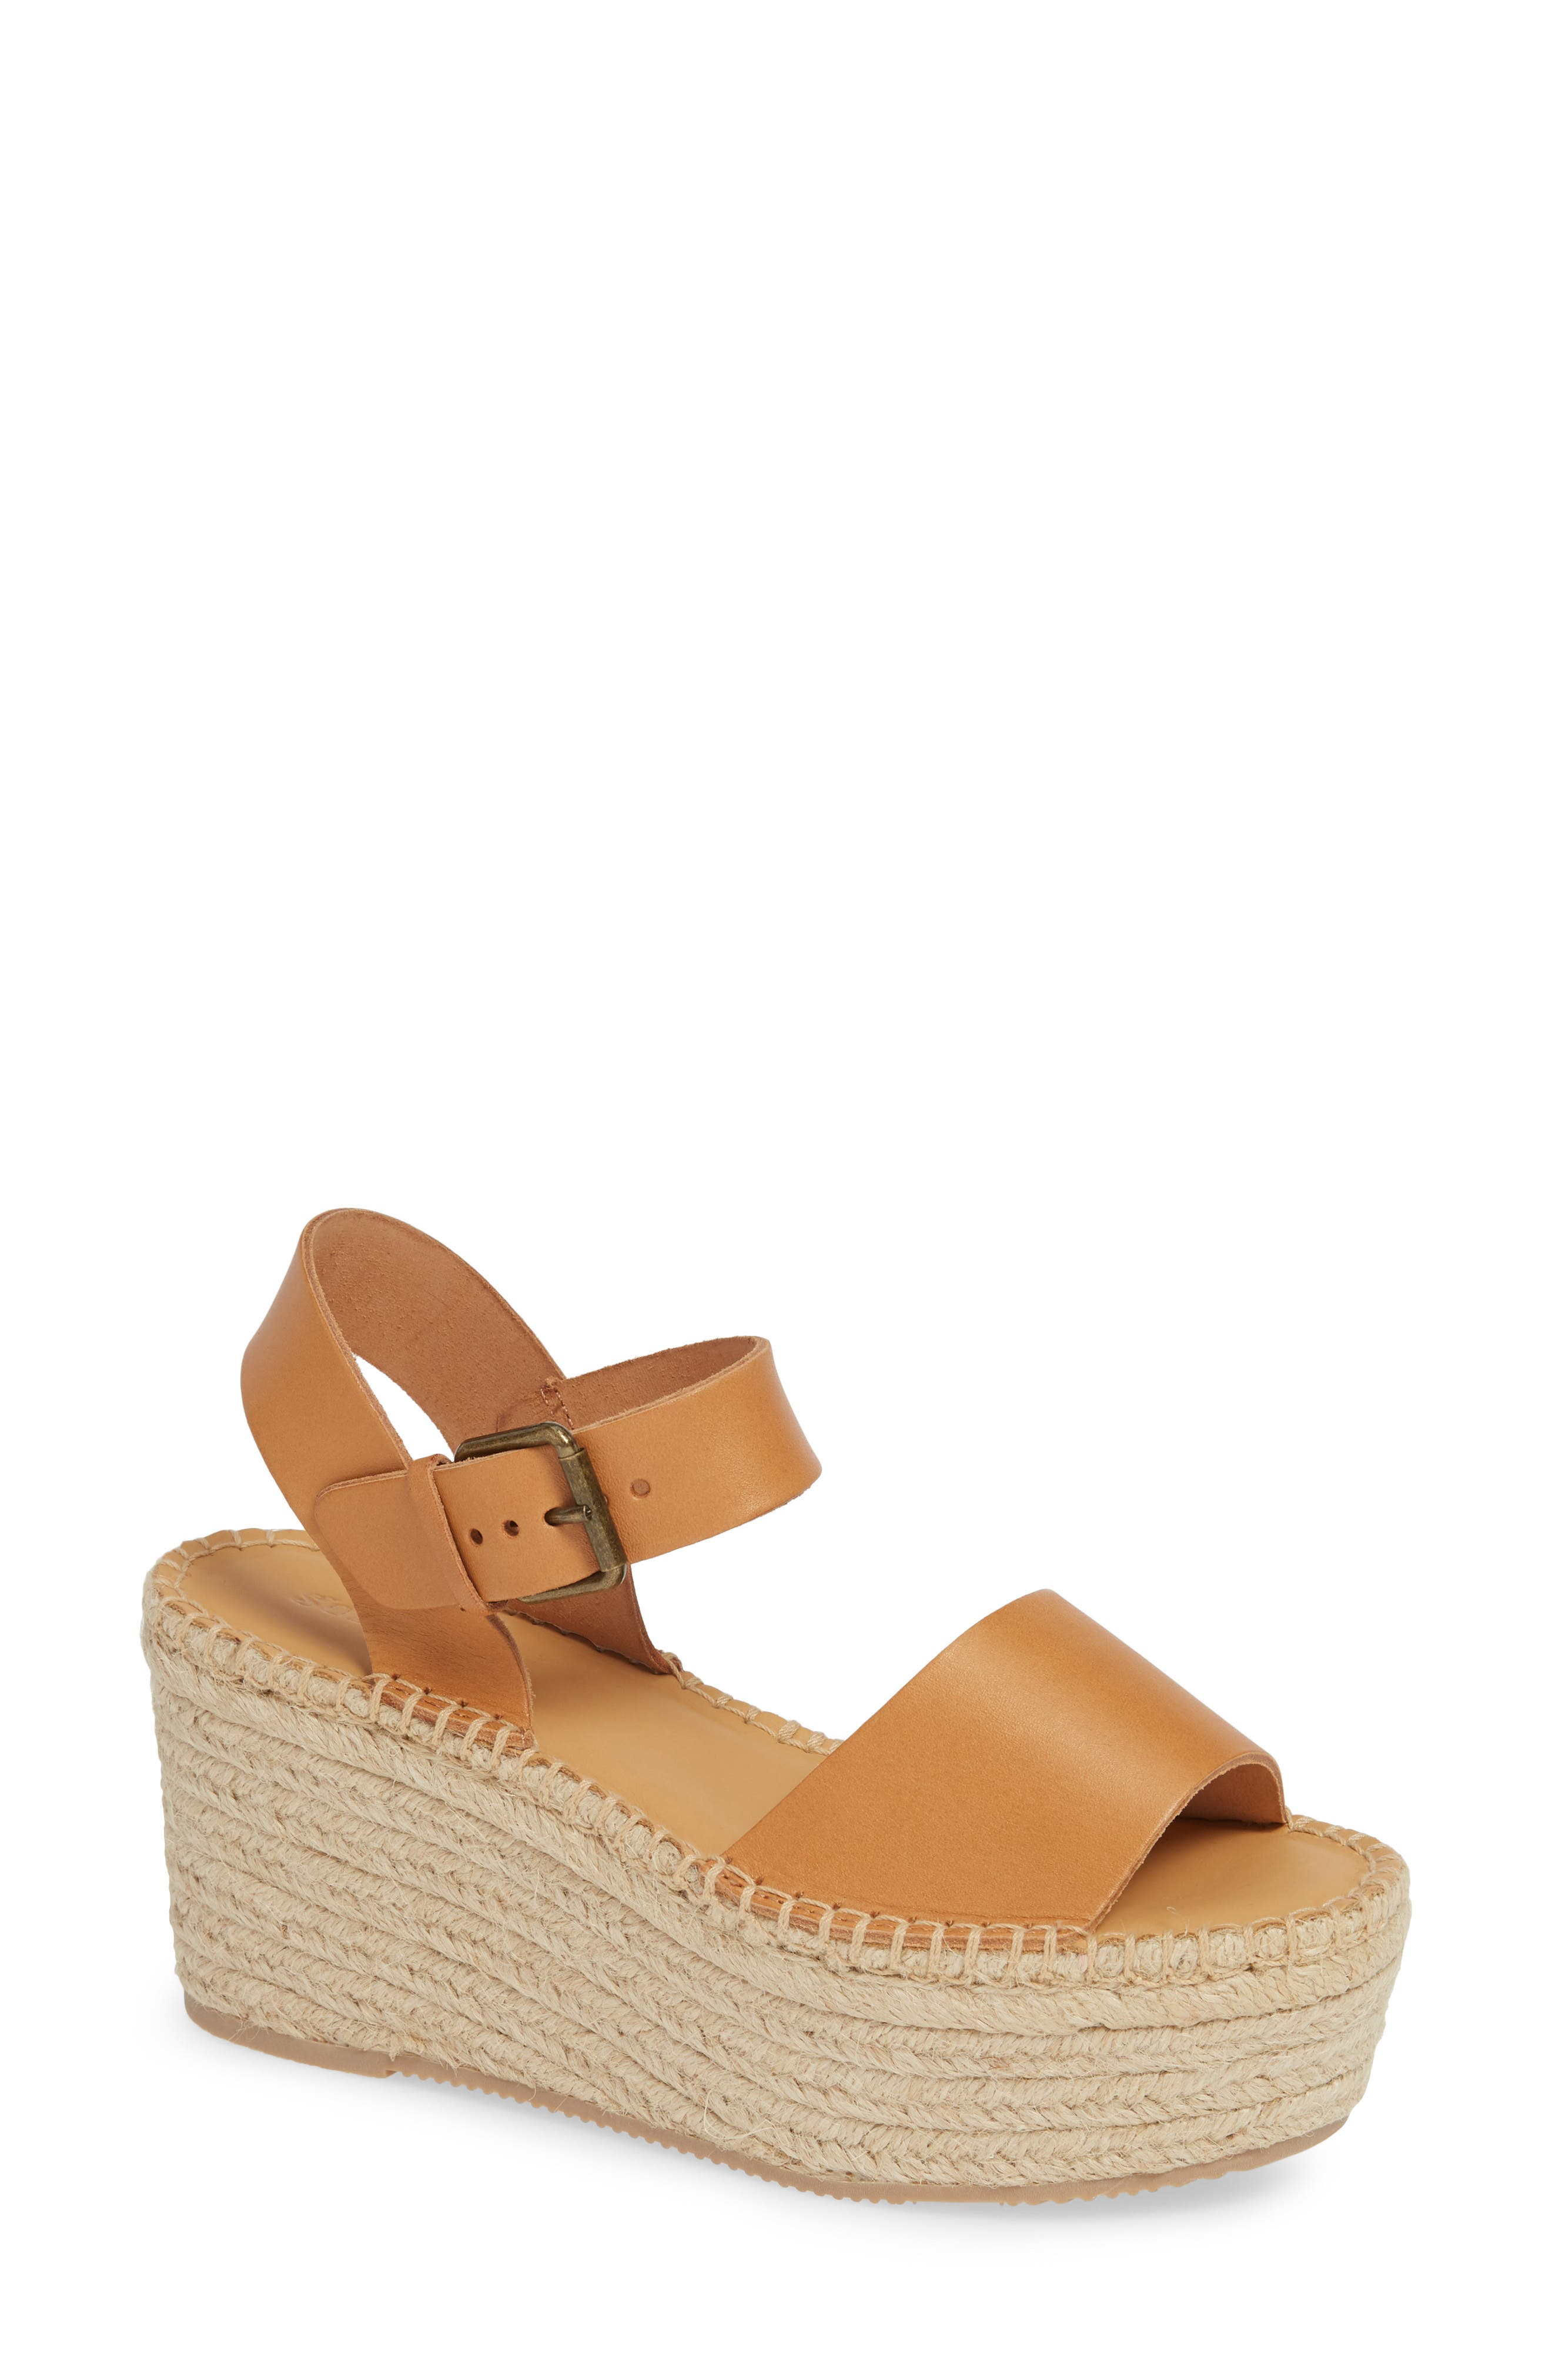 SOLUDOS Minorca Platform Wedge Sandal, Main, color, NUDE LEATHER